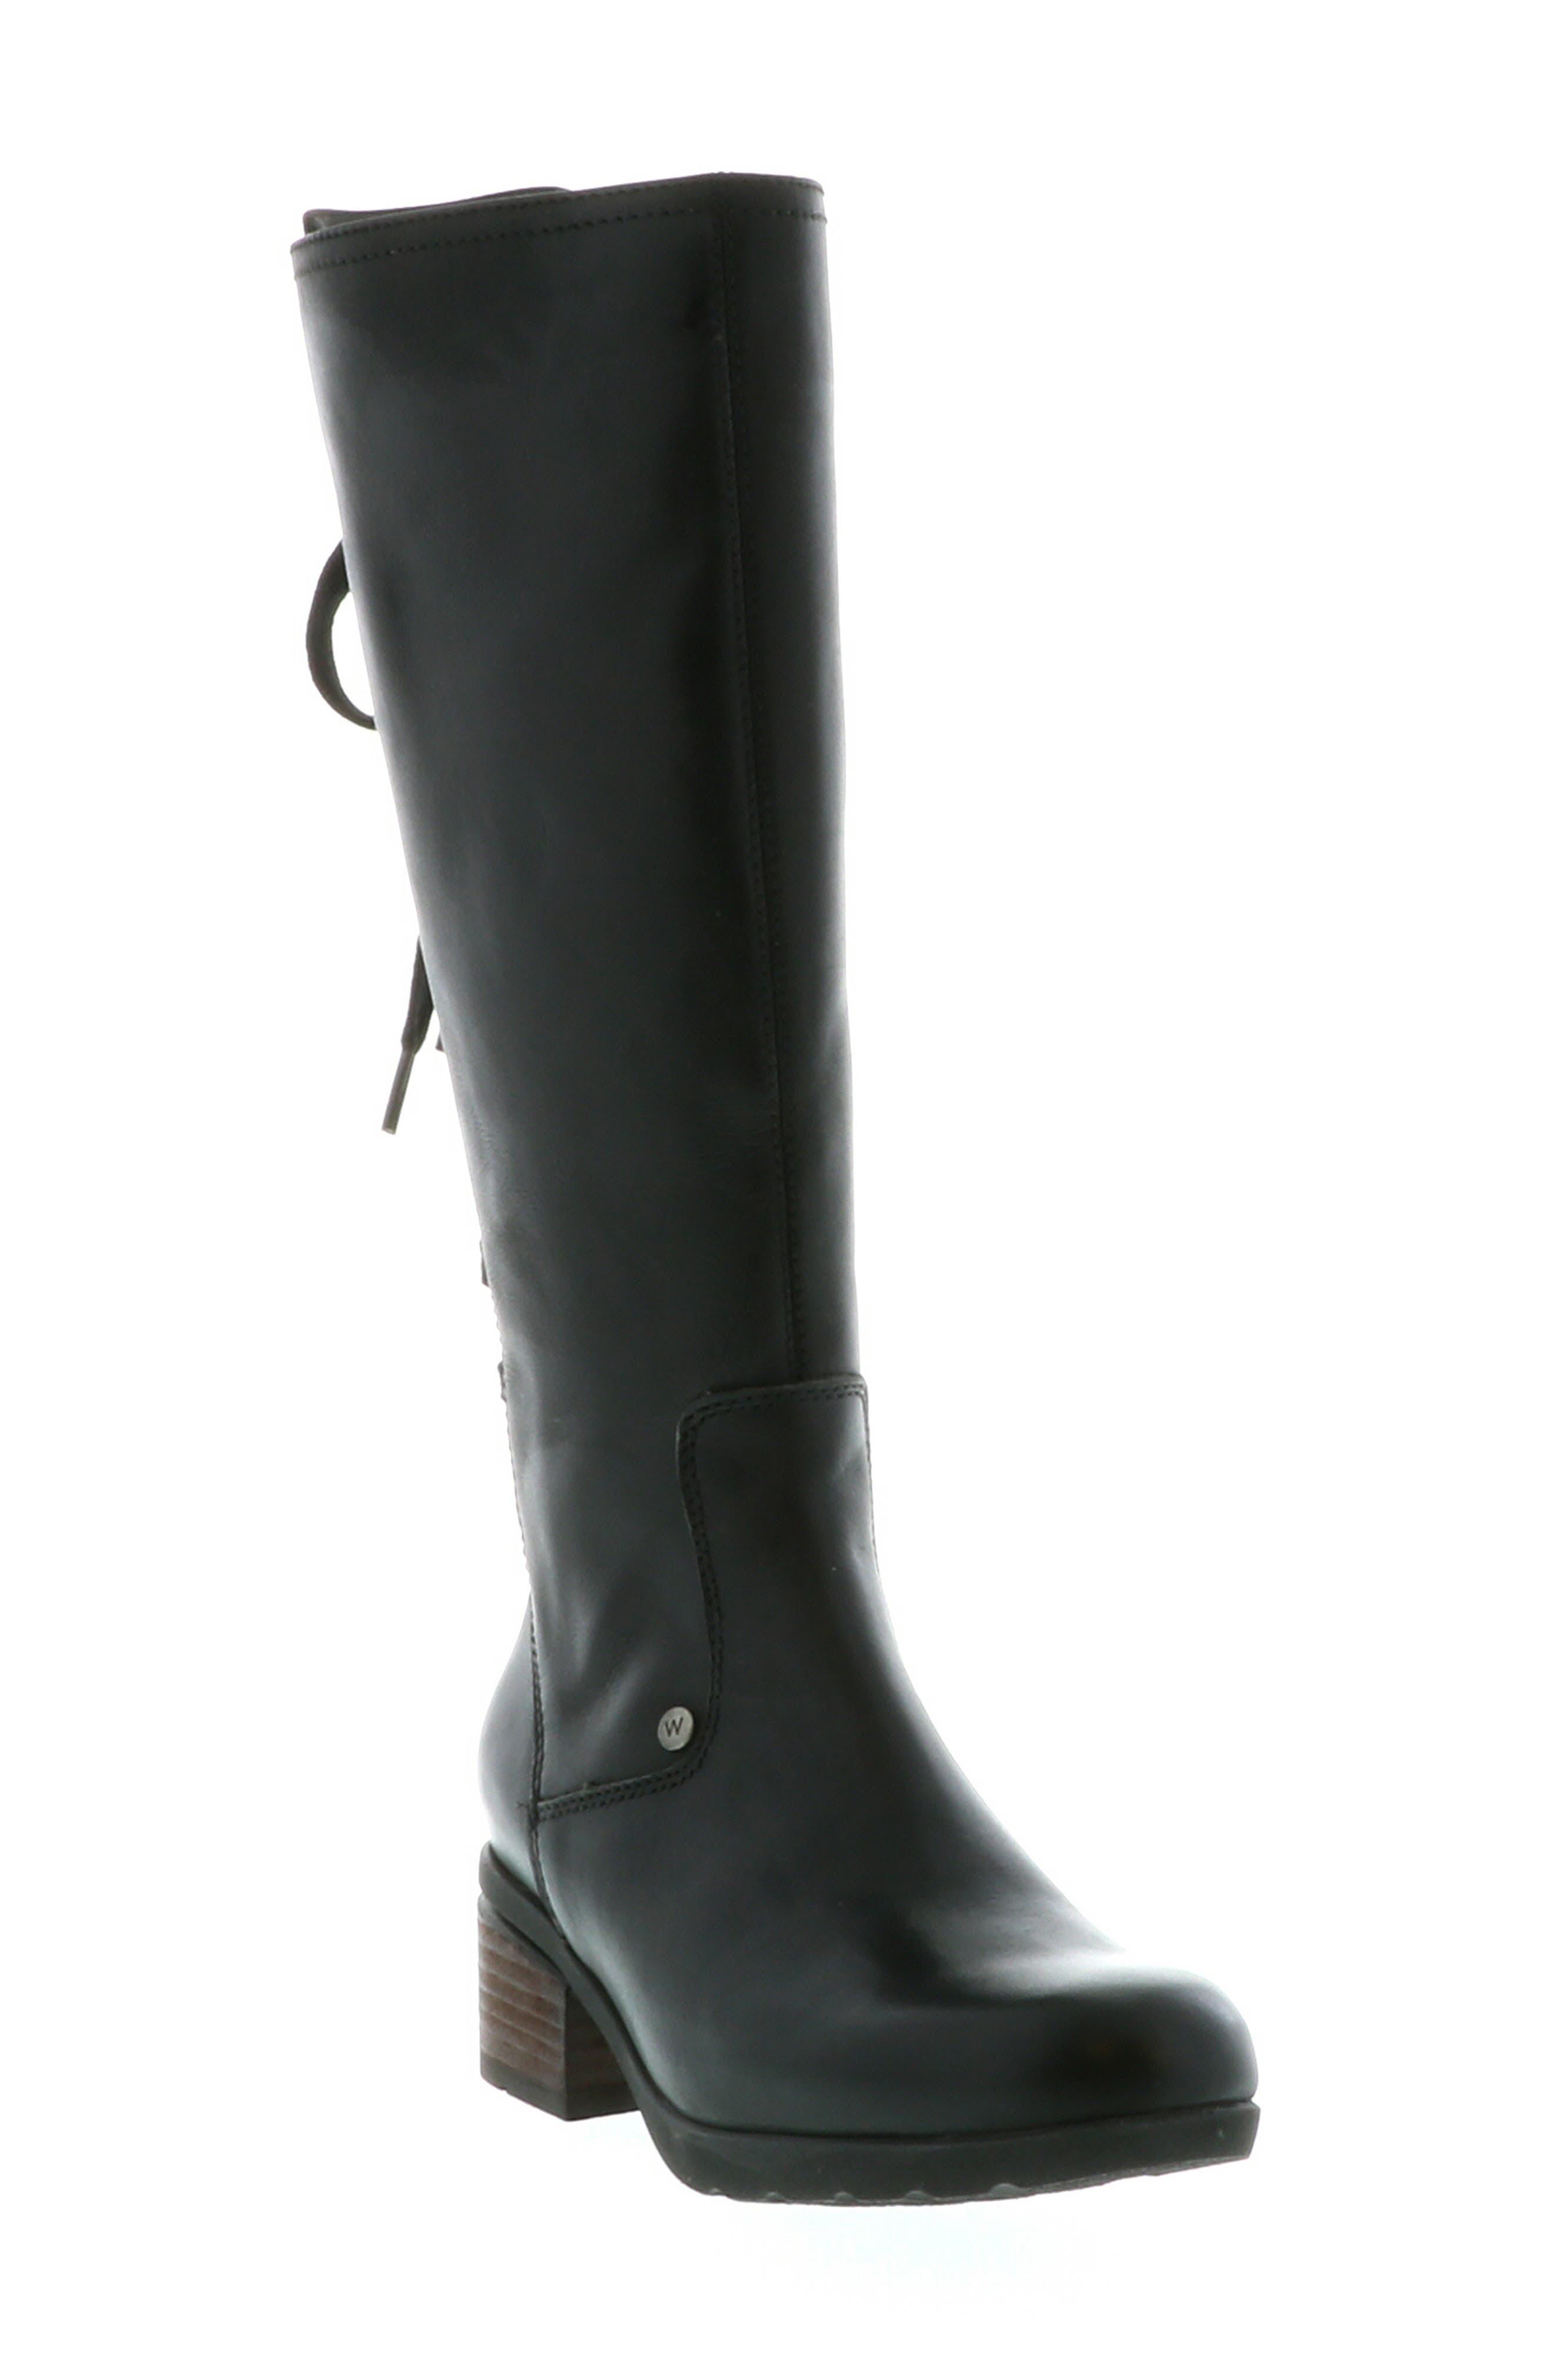 Wolky Hayen Knee High Boot, Black